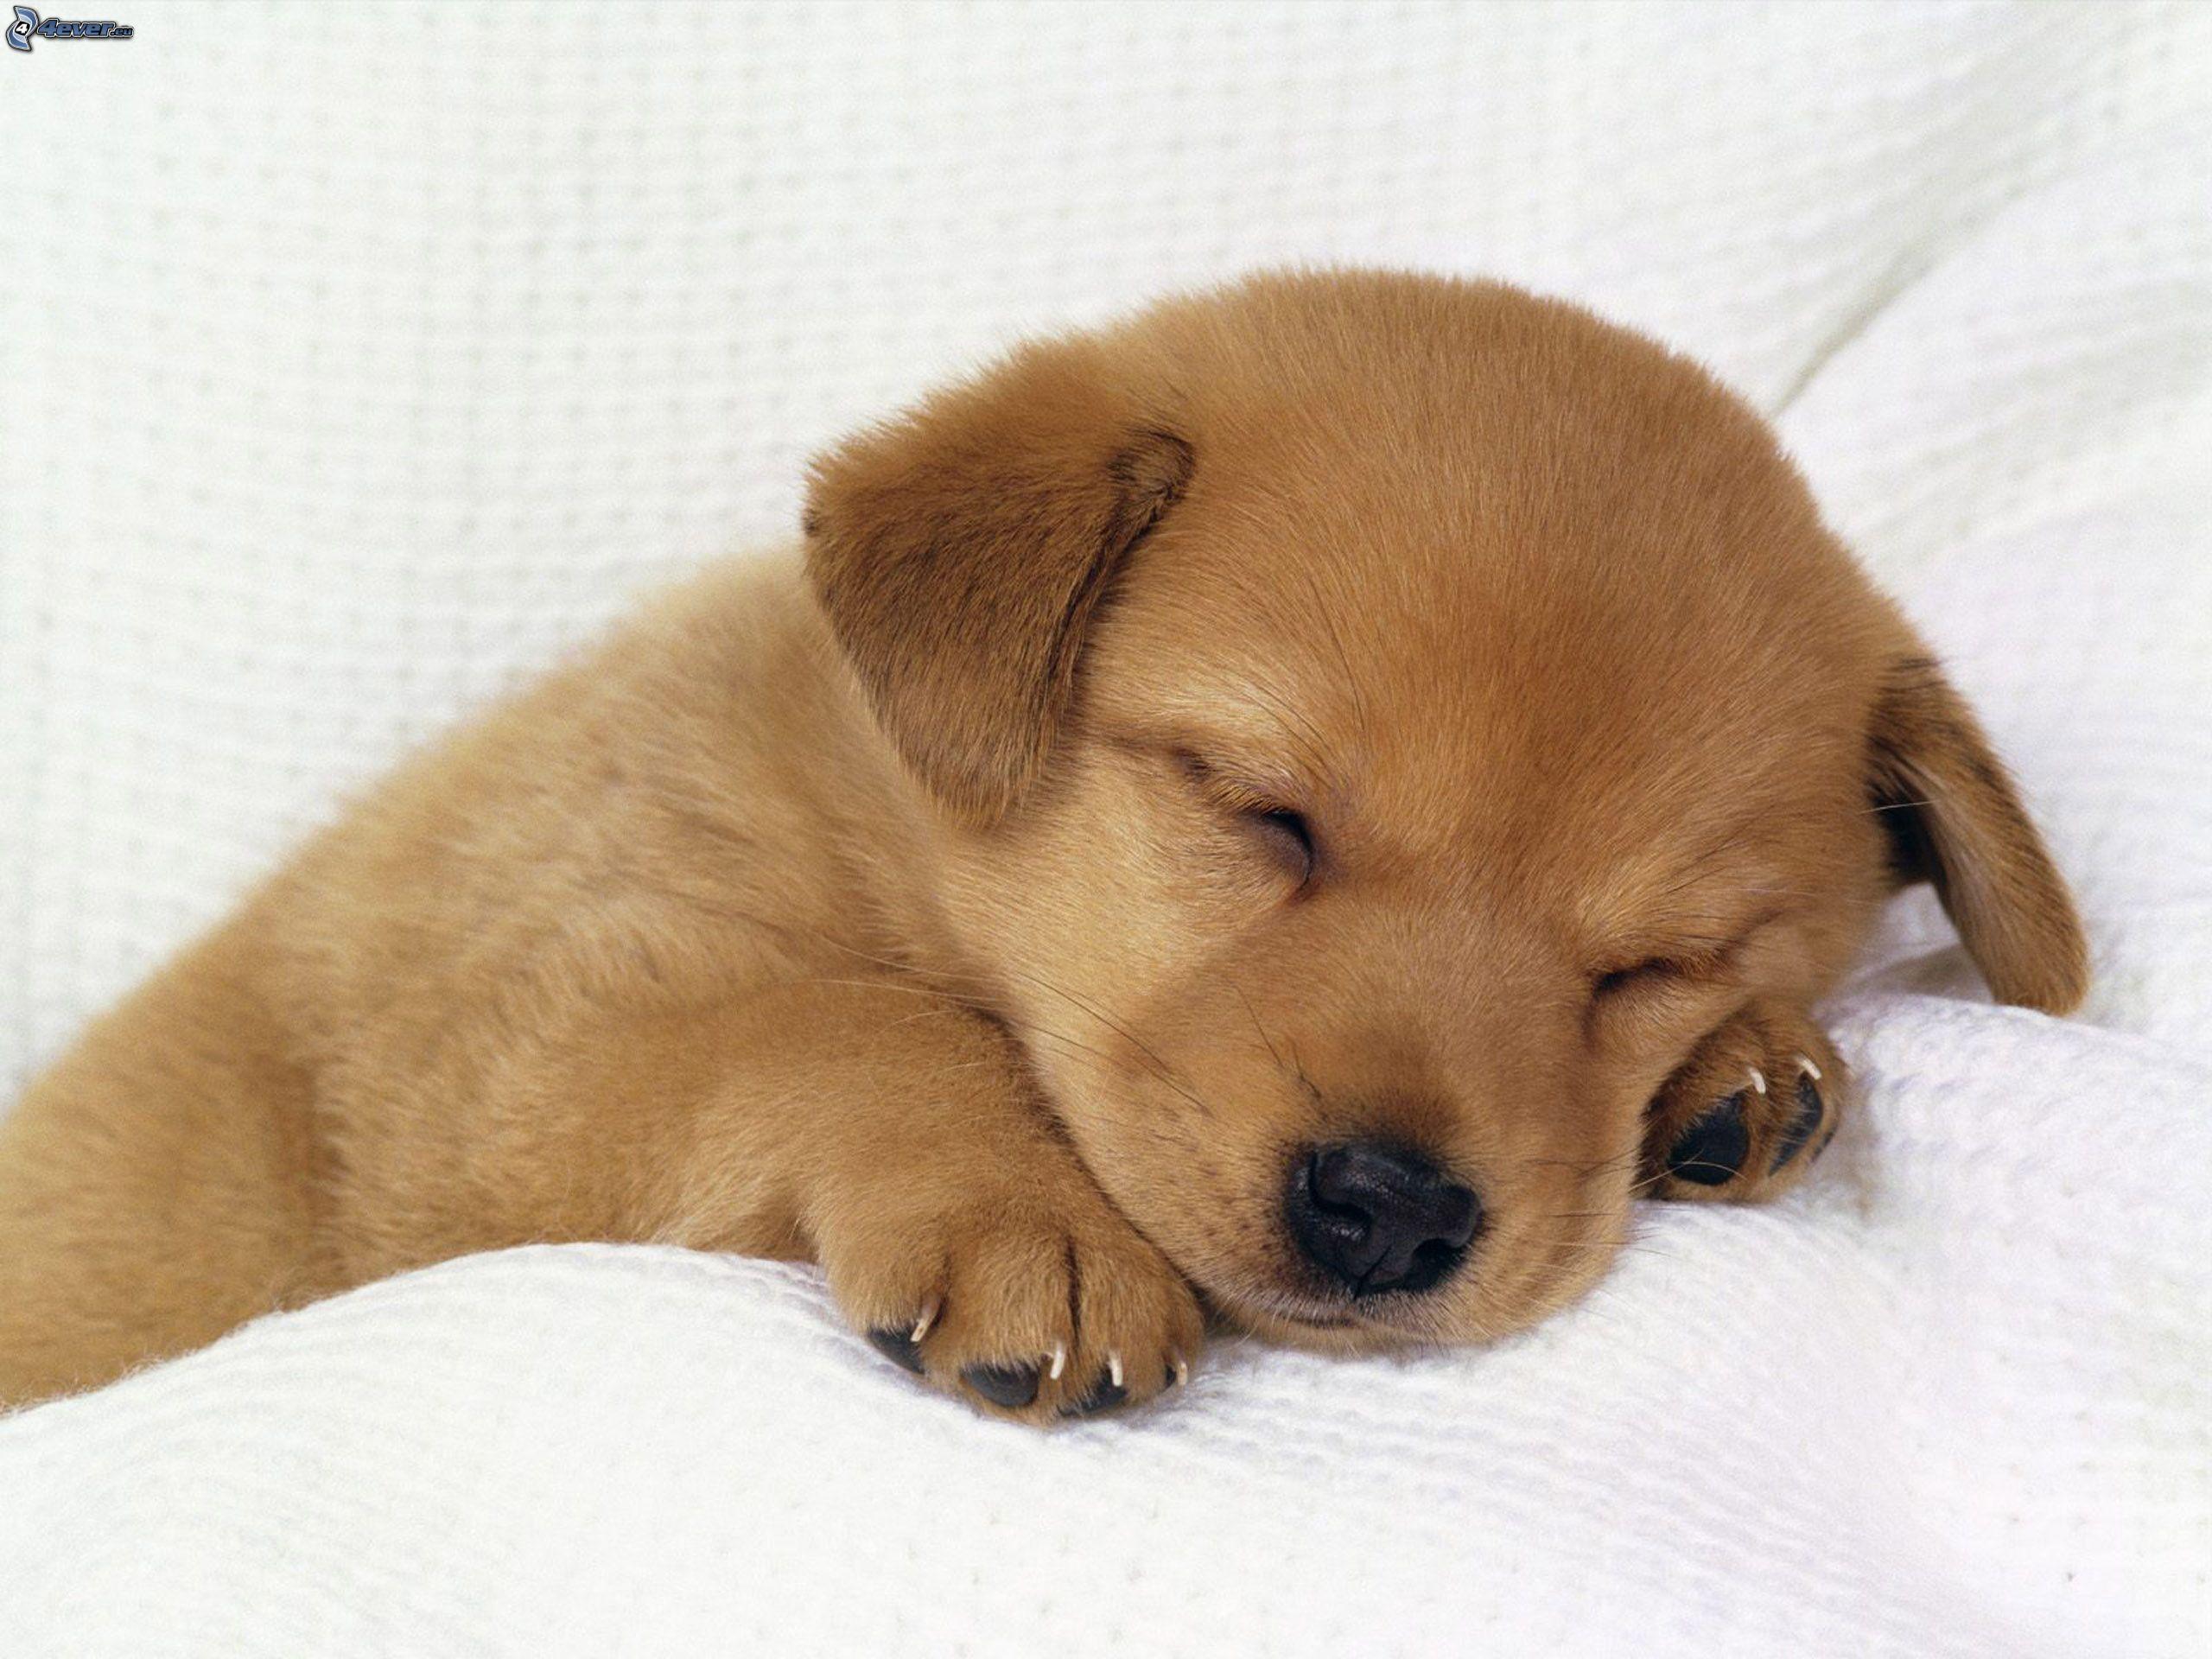 Free Photo Cute Sleeping Puppy Baby Face Sleepy Free Download Jooinn